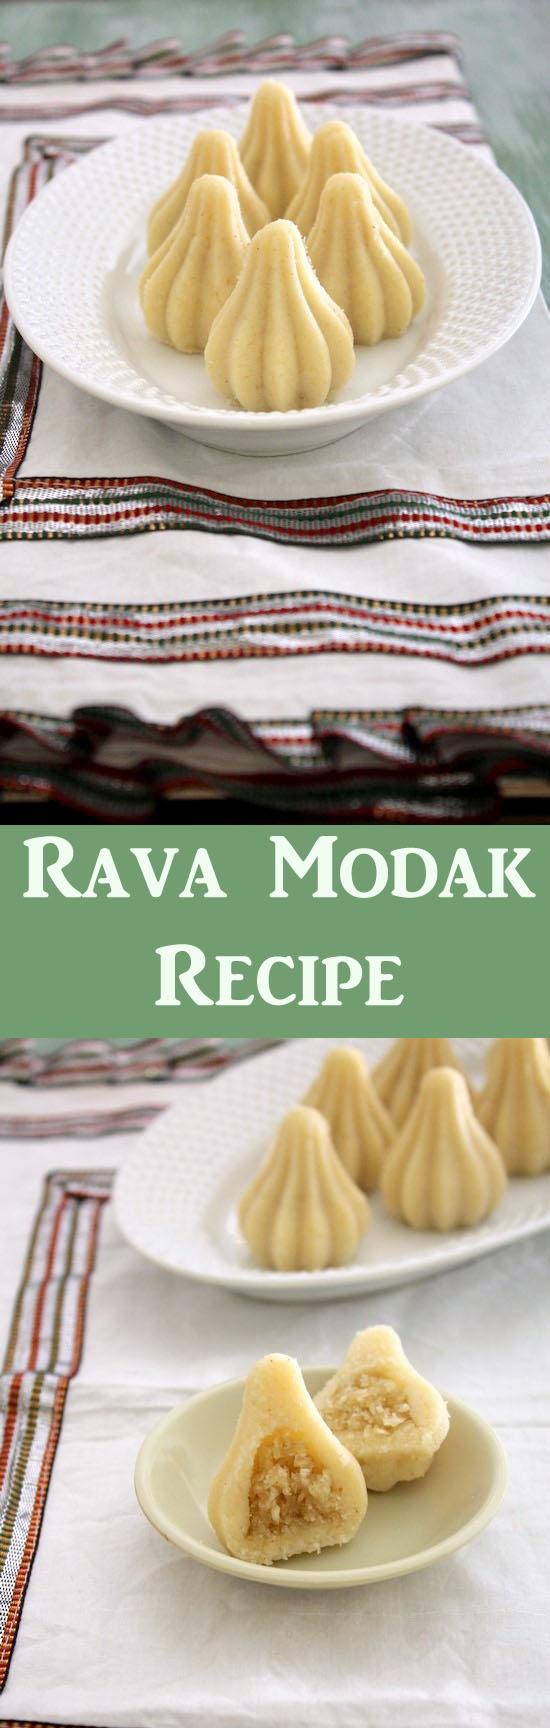 Rava modak recipe for Ganesh Chaturthi | Semolina modak